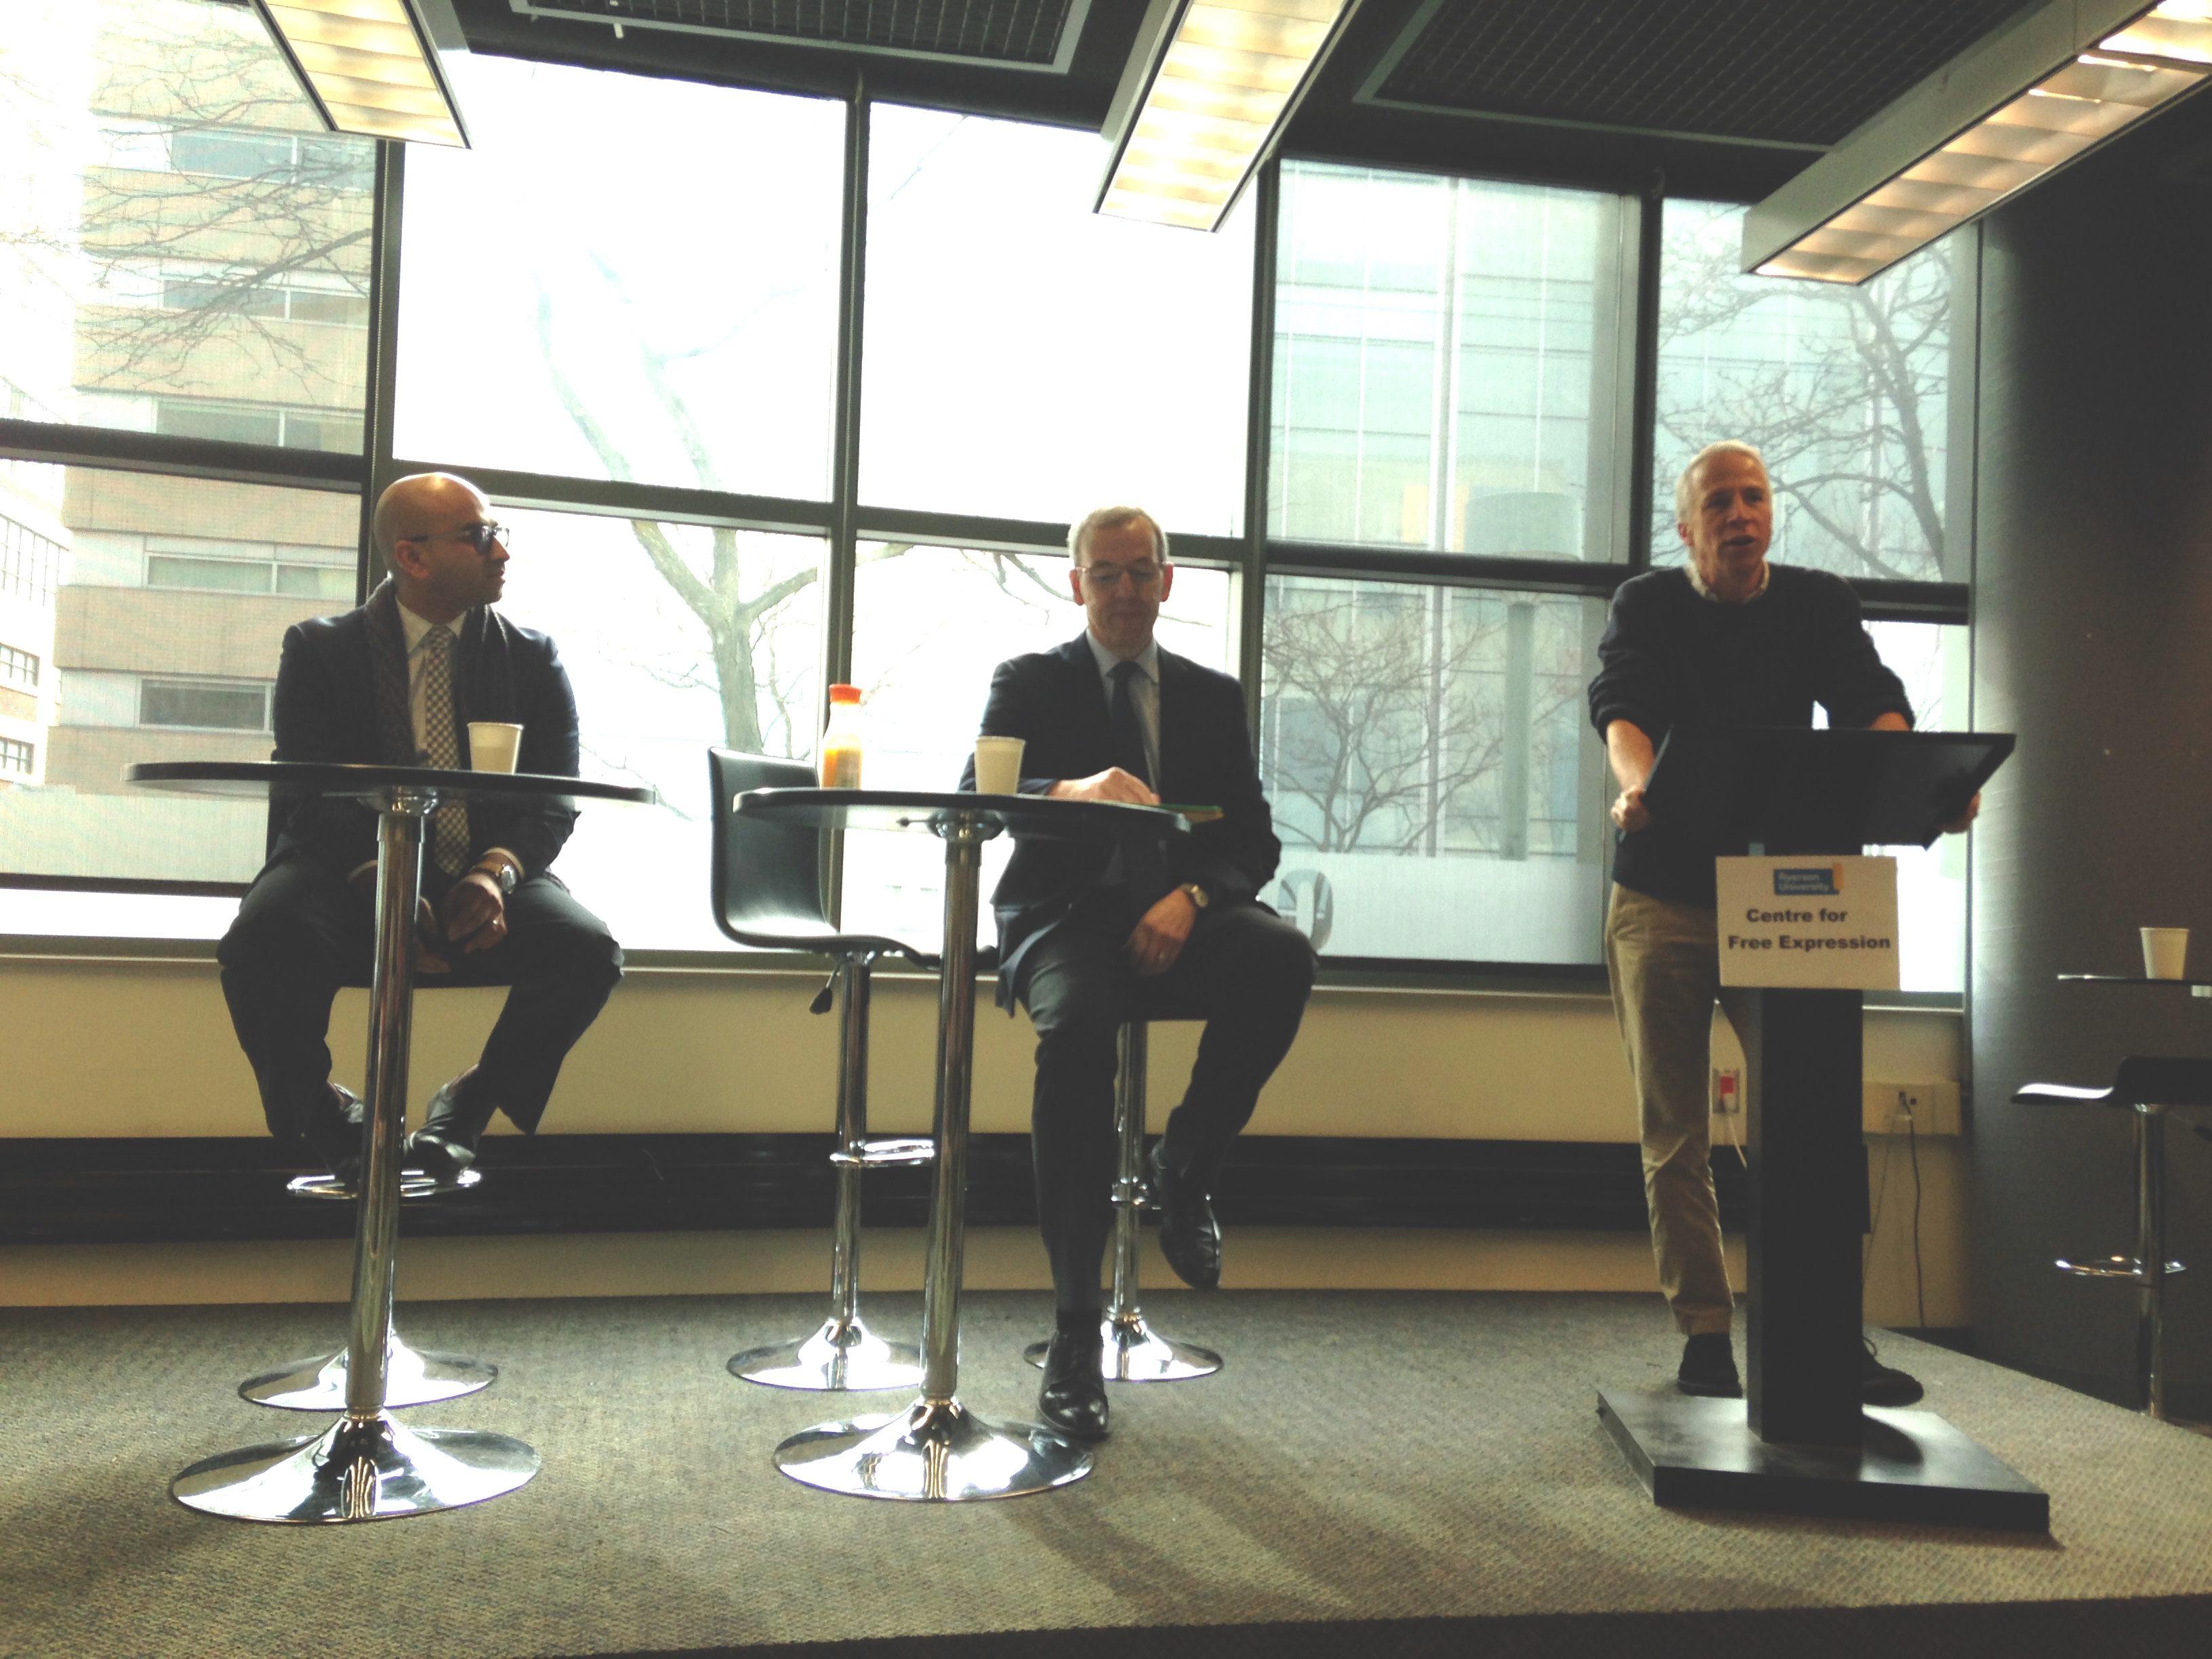 Man at podium next to two men sitting at tables